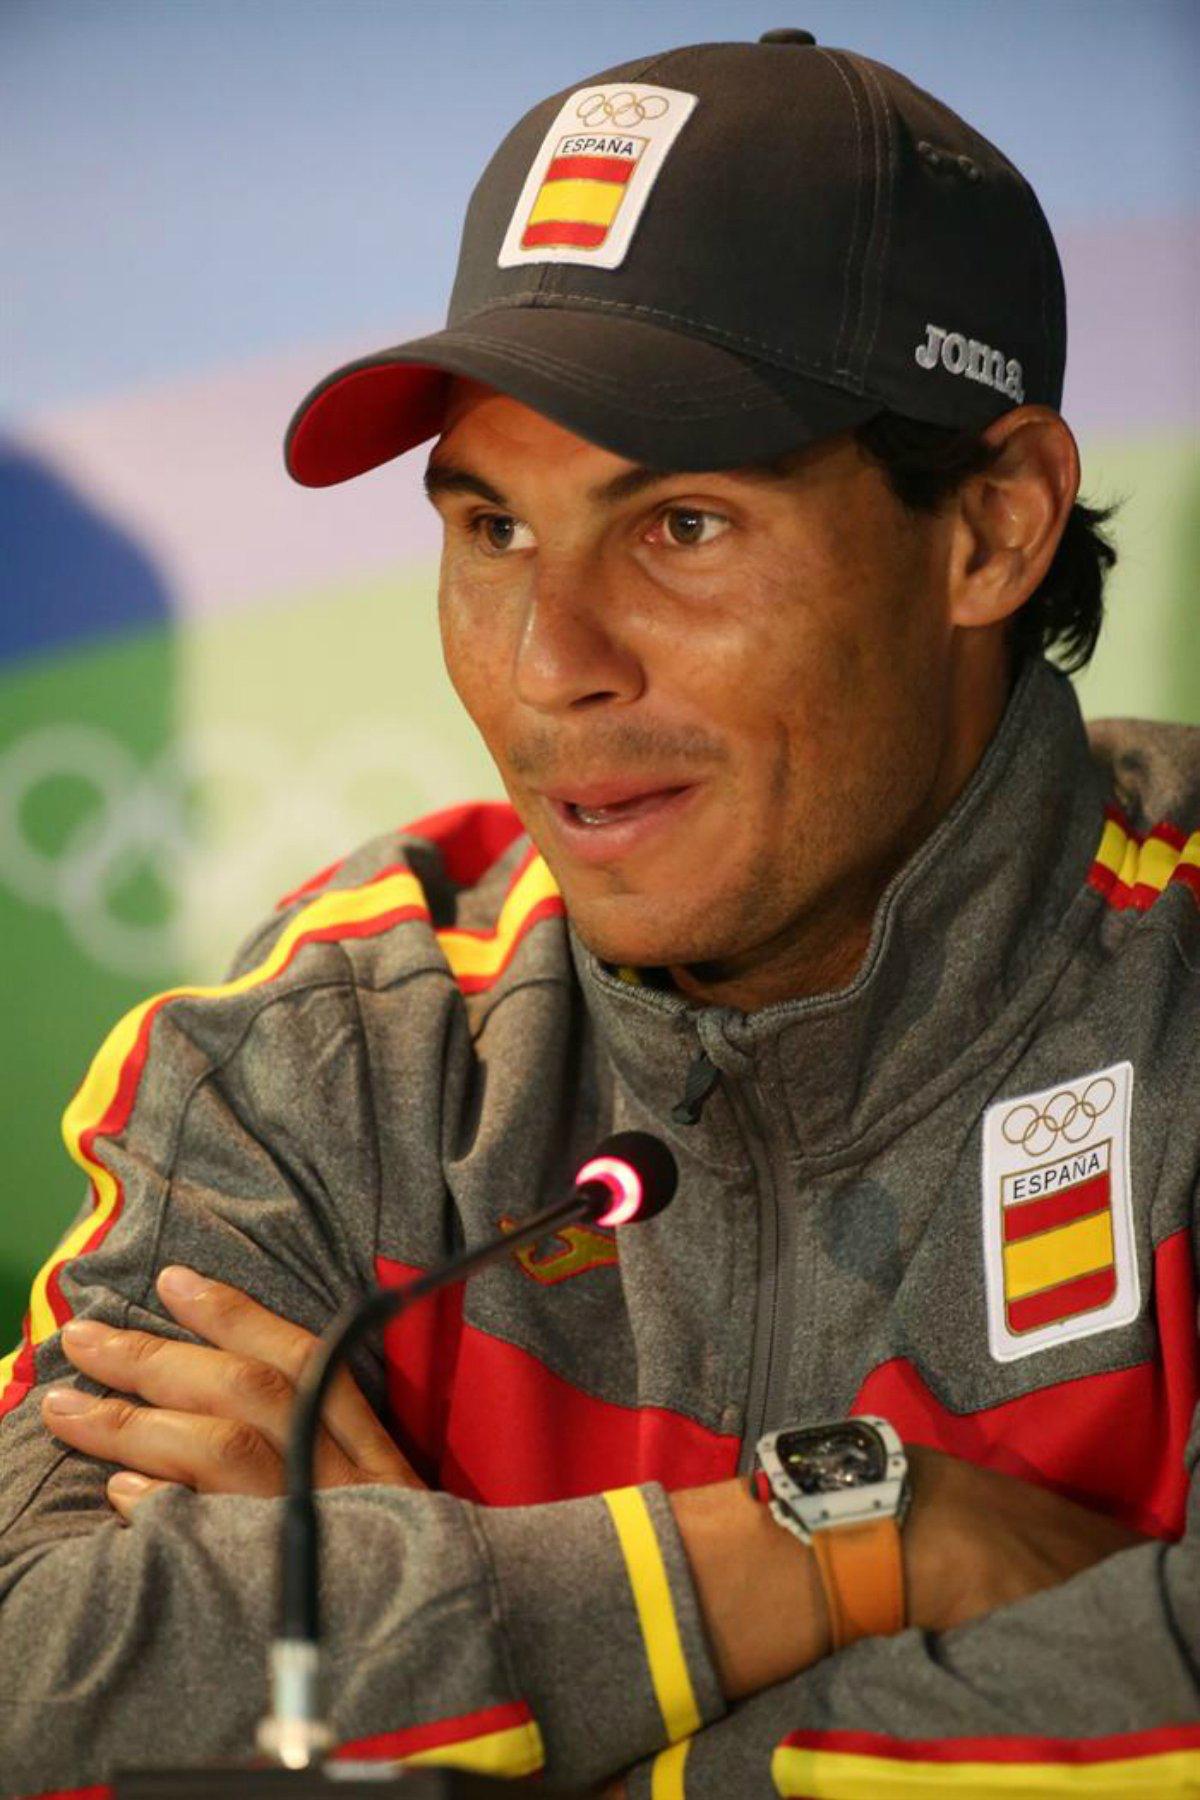 Rafa Nadal press conference photos (EFE)  Olympics 2016 Rio